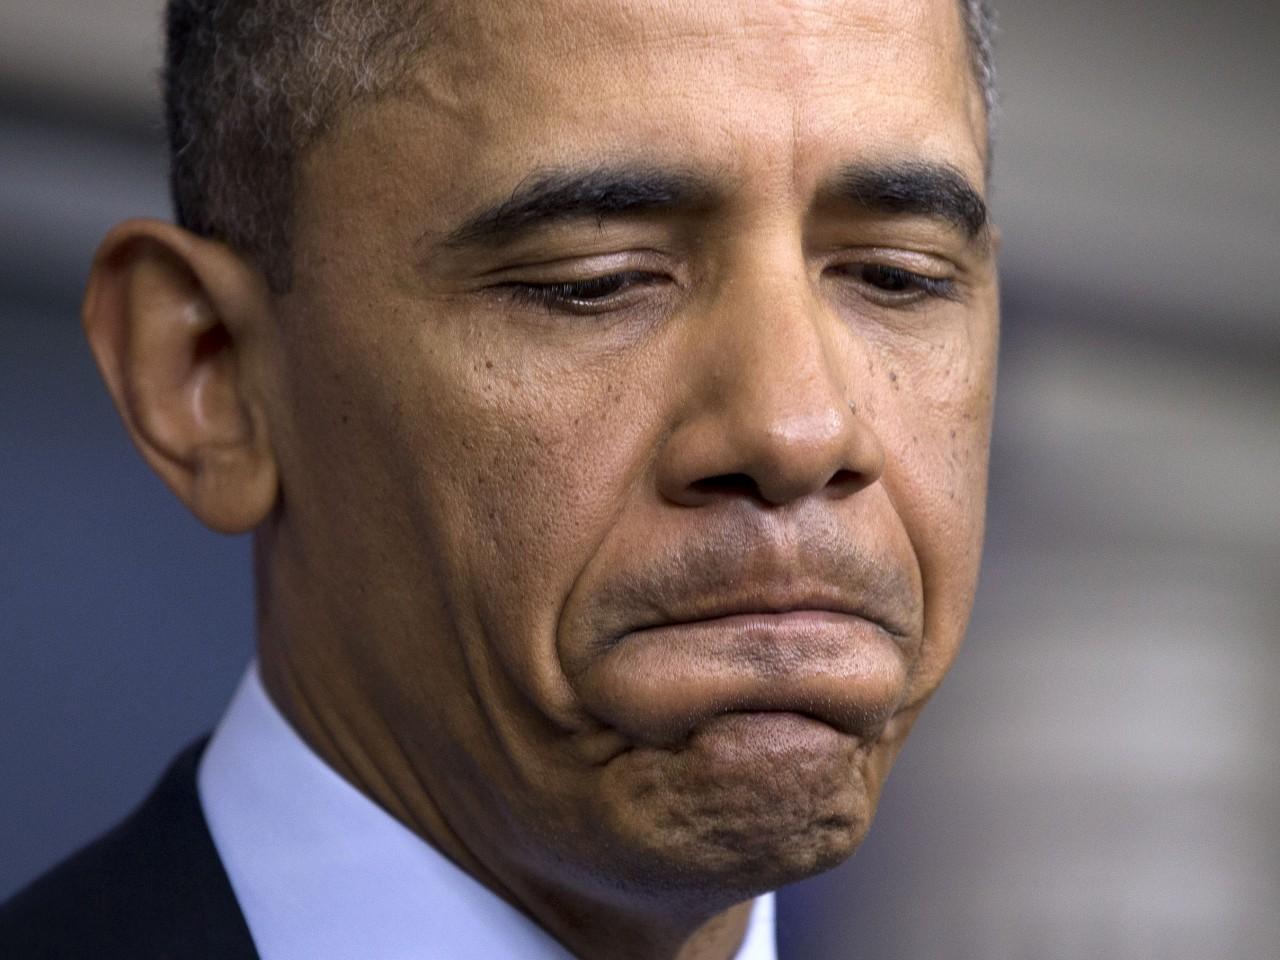 http://media.salon.com/2013/03/aptopix-obama-budget-battle.jpeg-1280x960.jpg